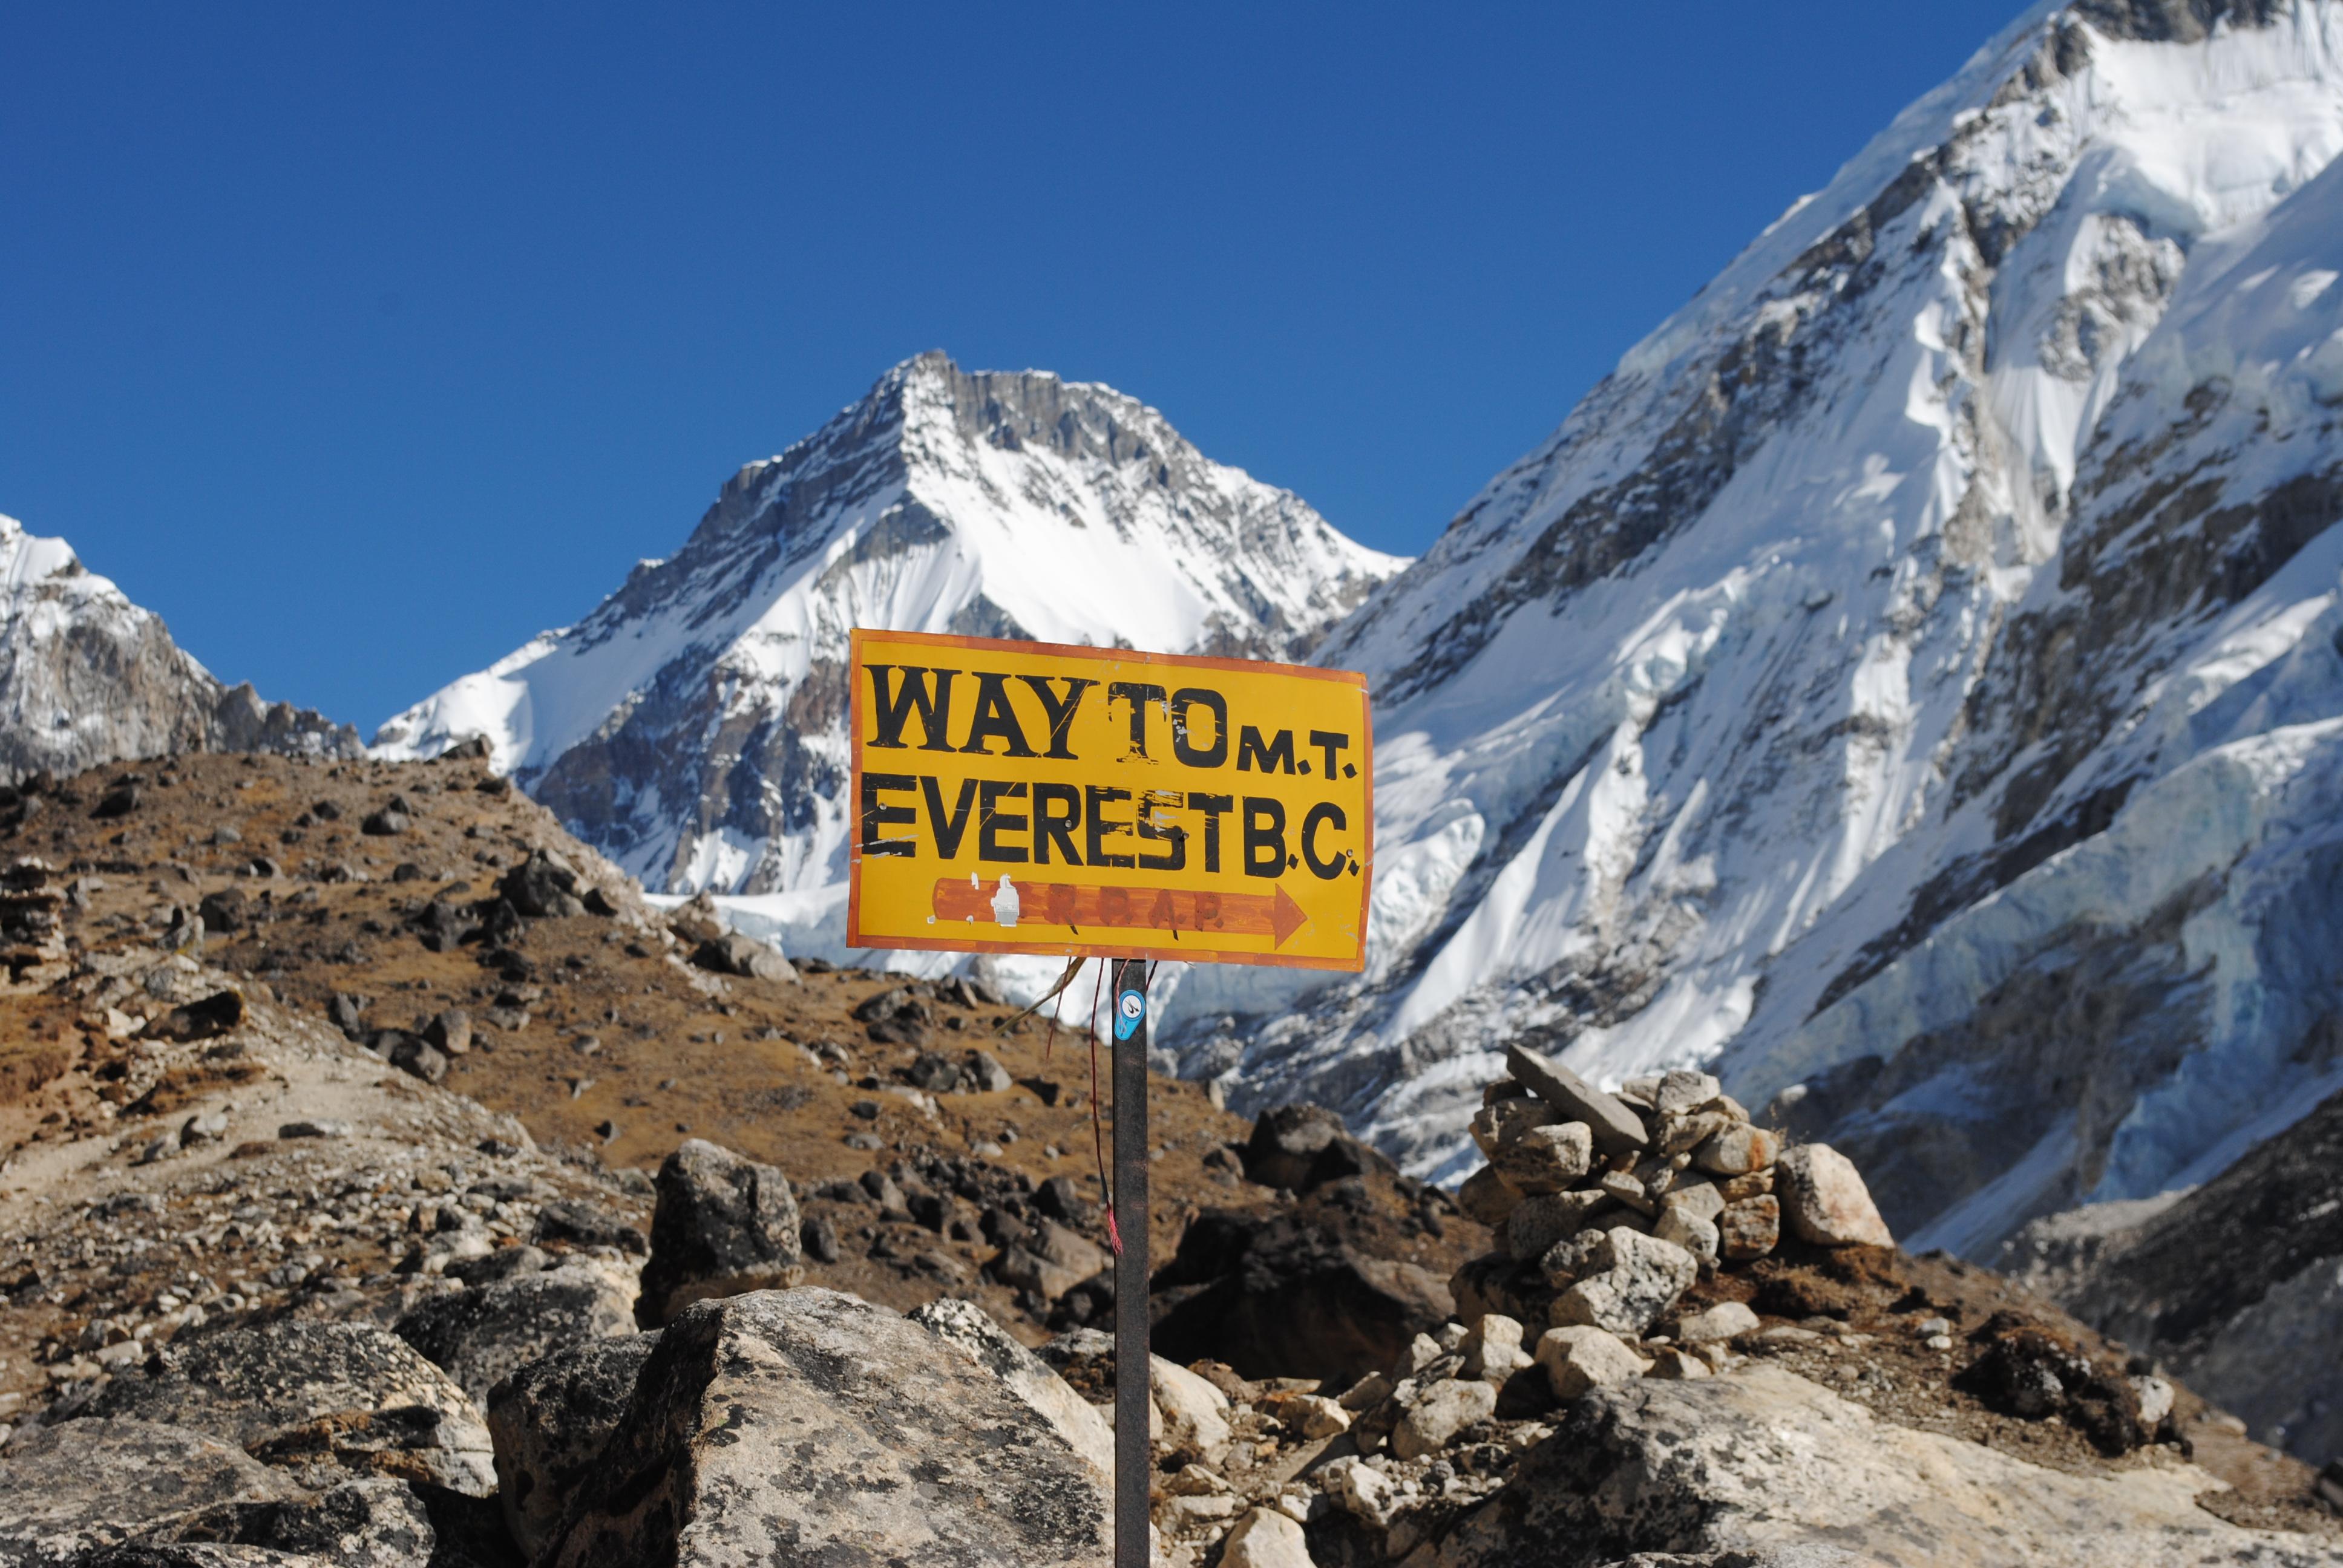 Ice Fall Wallpaper Storms Slow Start To Everest Season As Lukla Flights